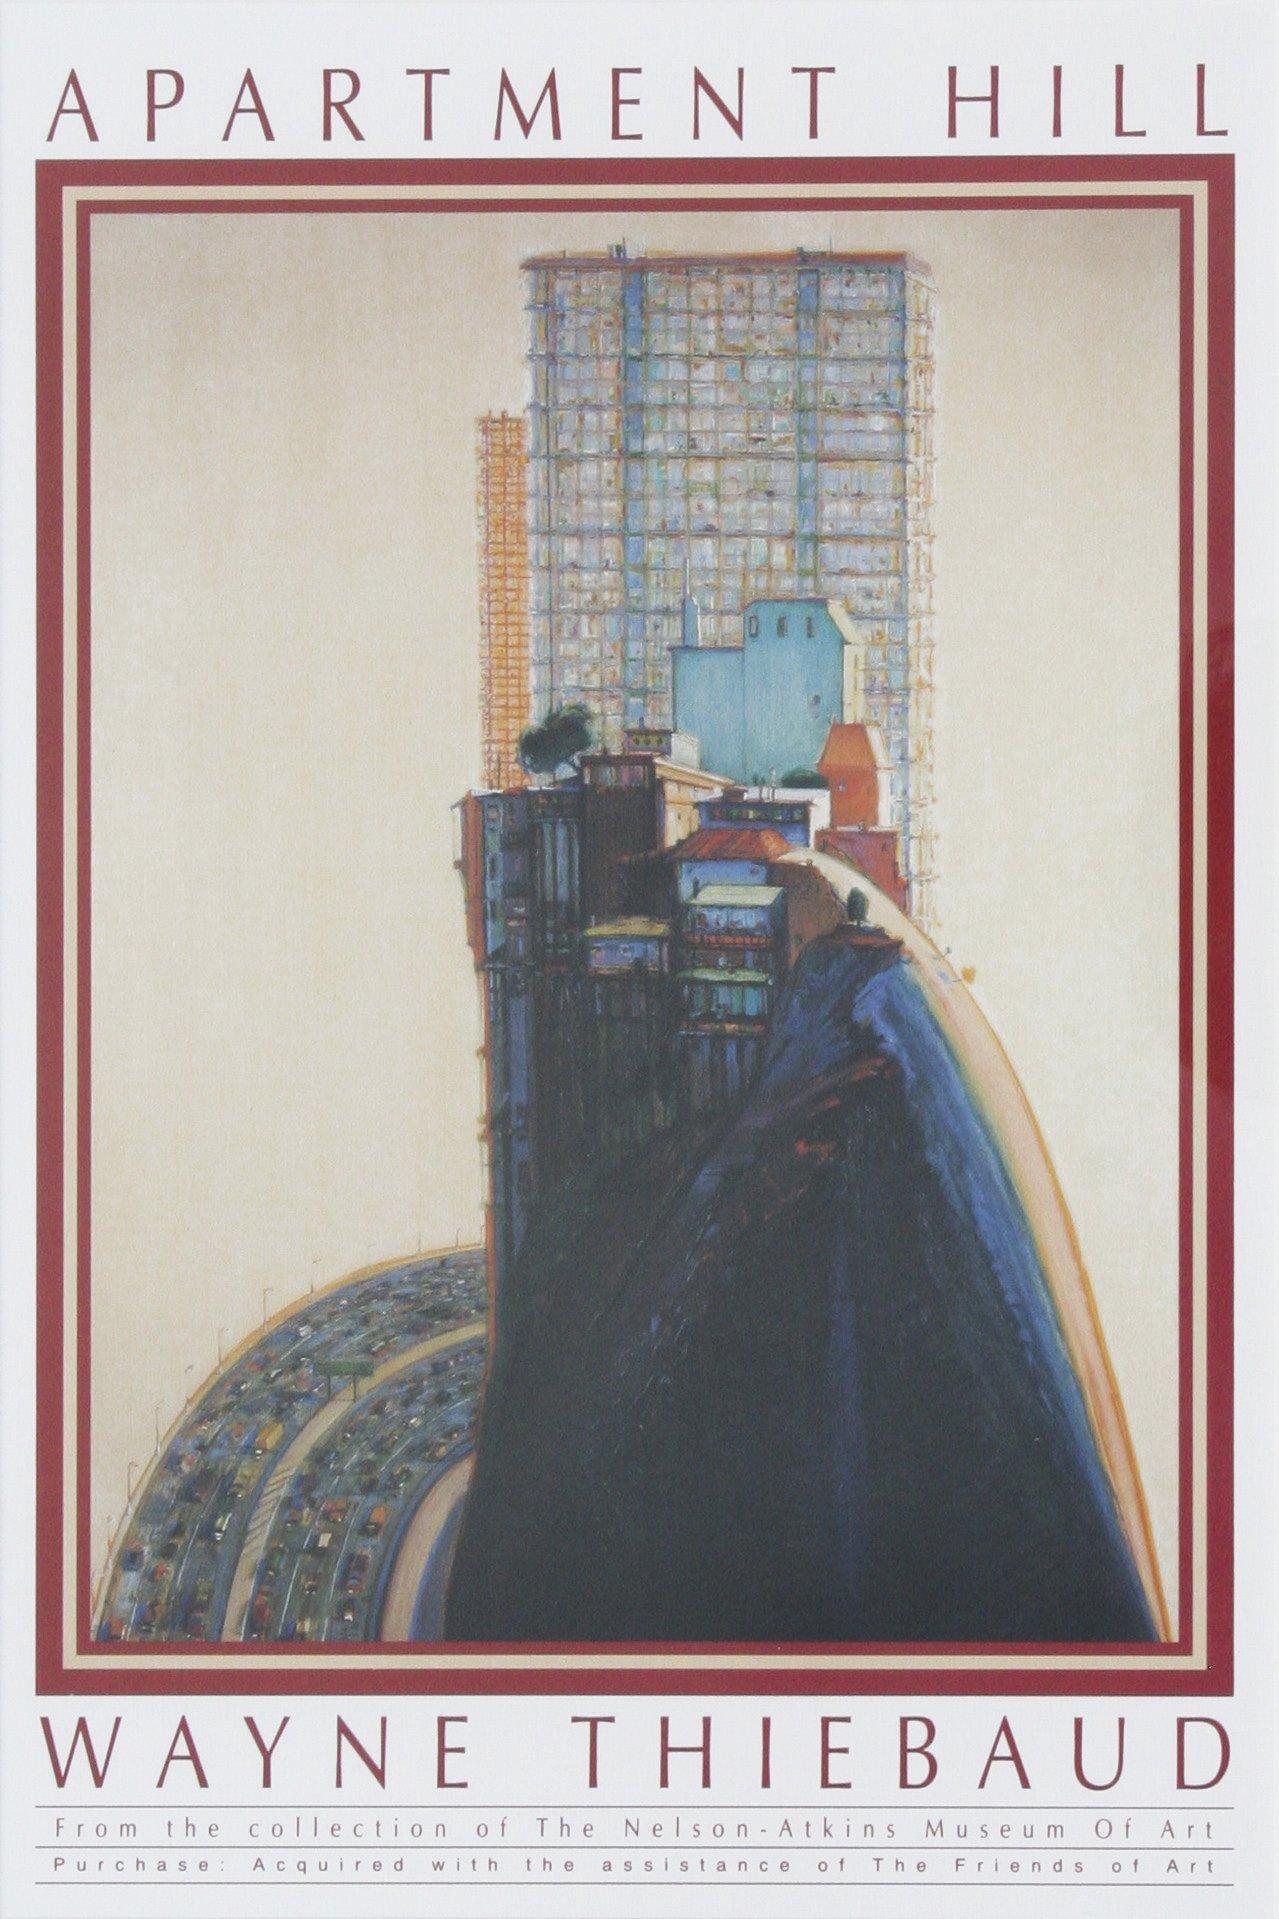 Wayne Thiebaud Apartment Hill